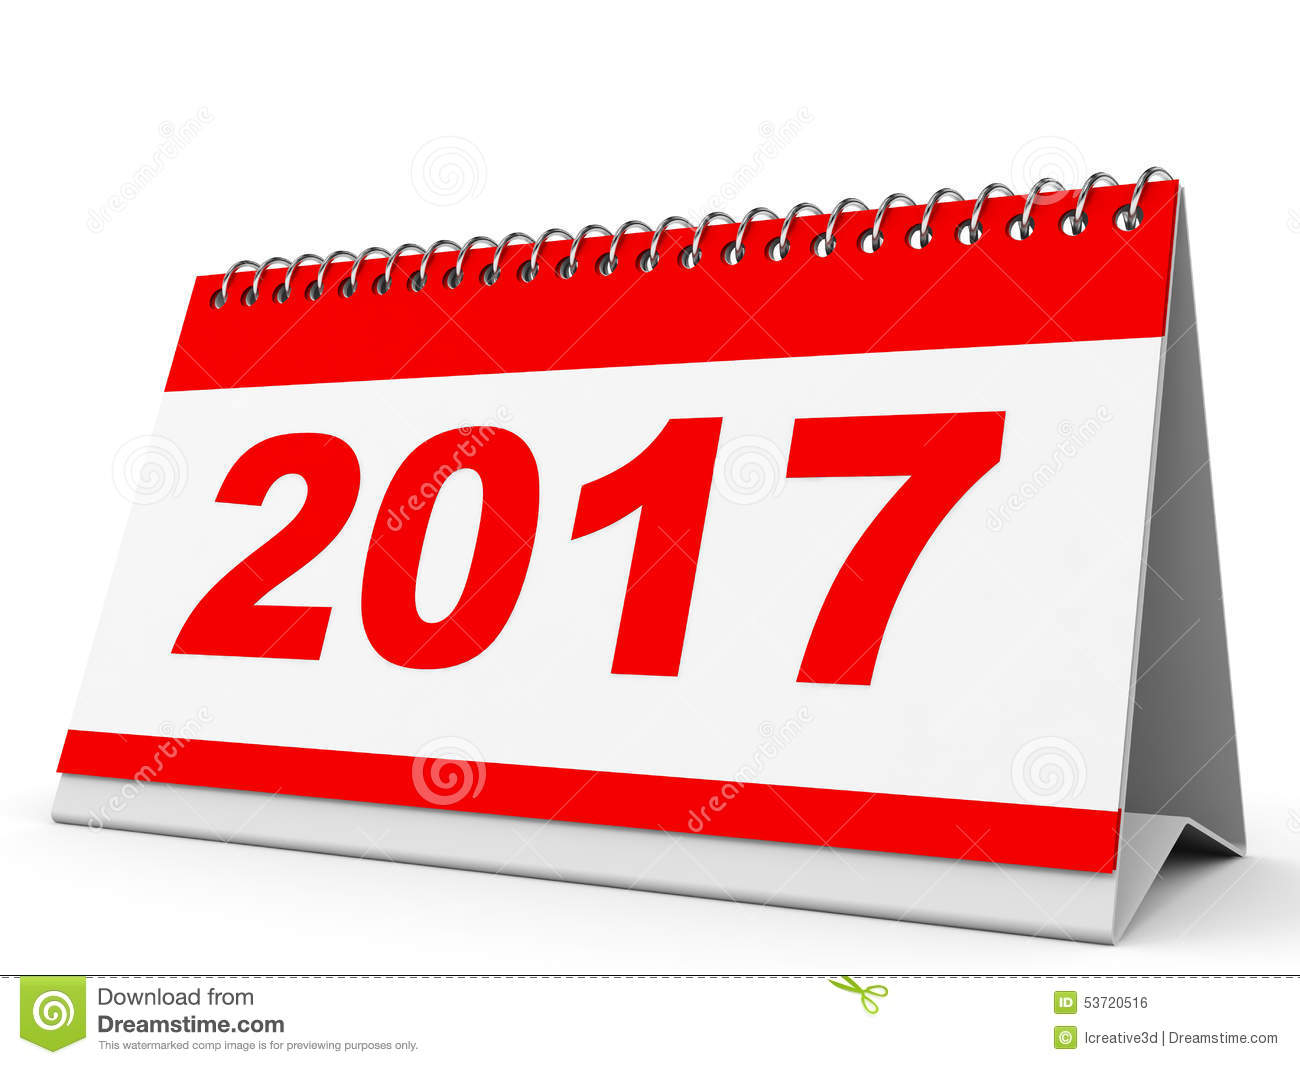 December january calendar 2017 clipart vector free download December january calendar 2017 clipart - ClipartFest vector free download